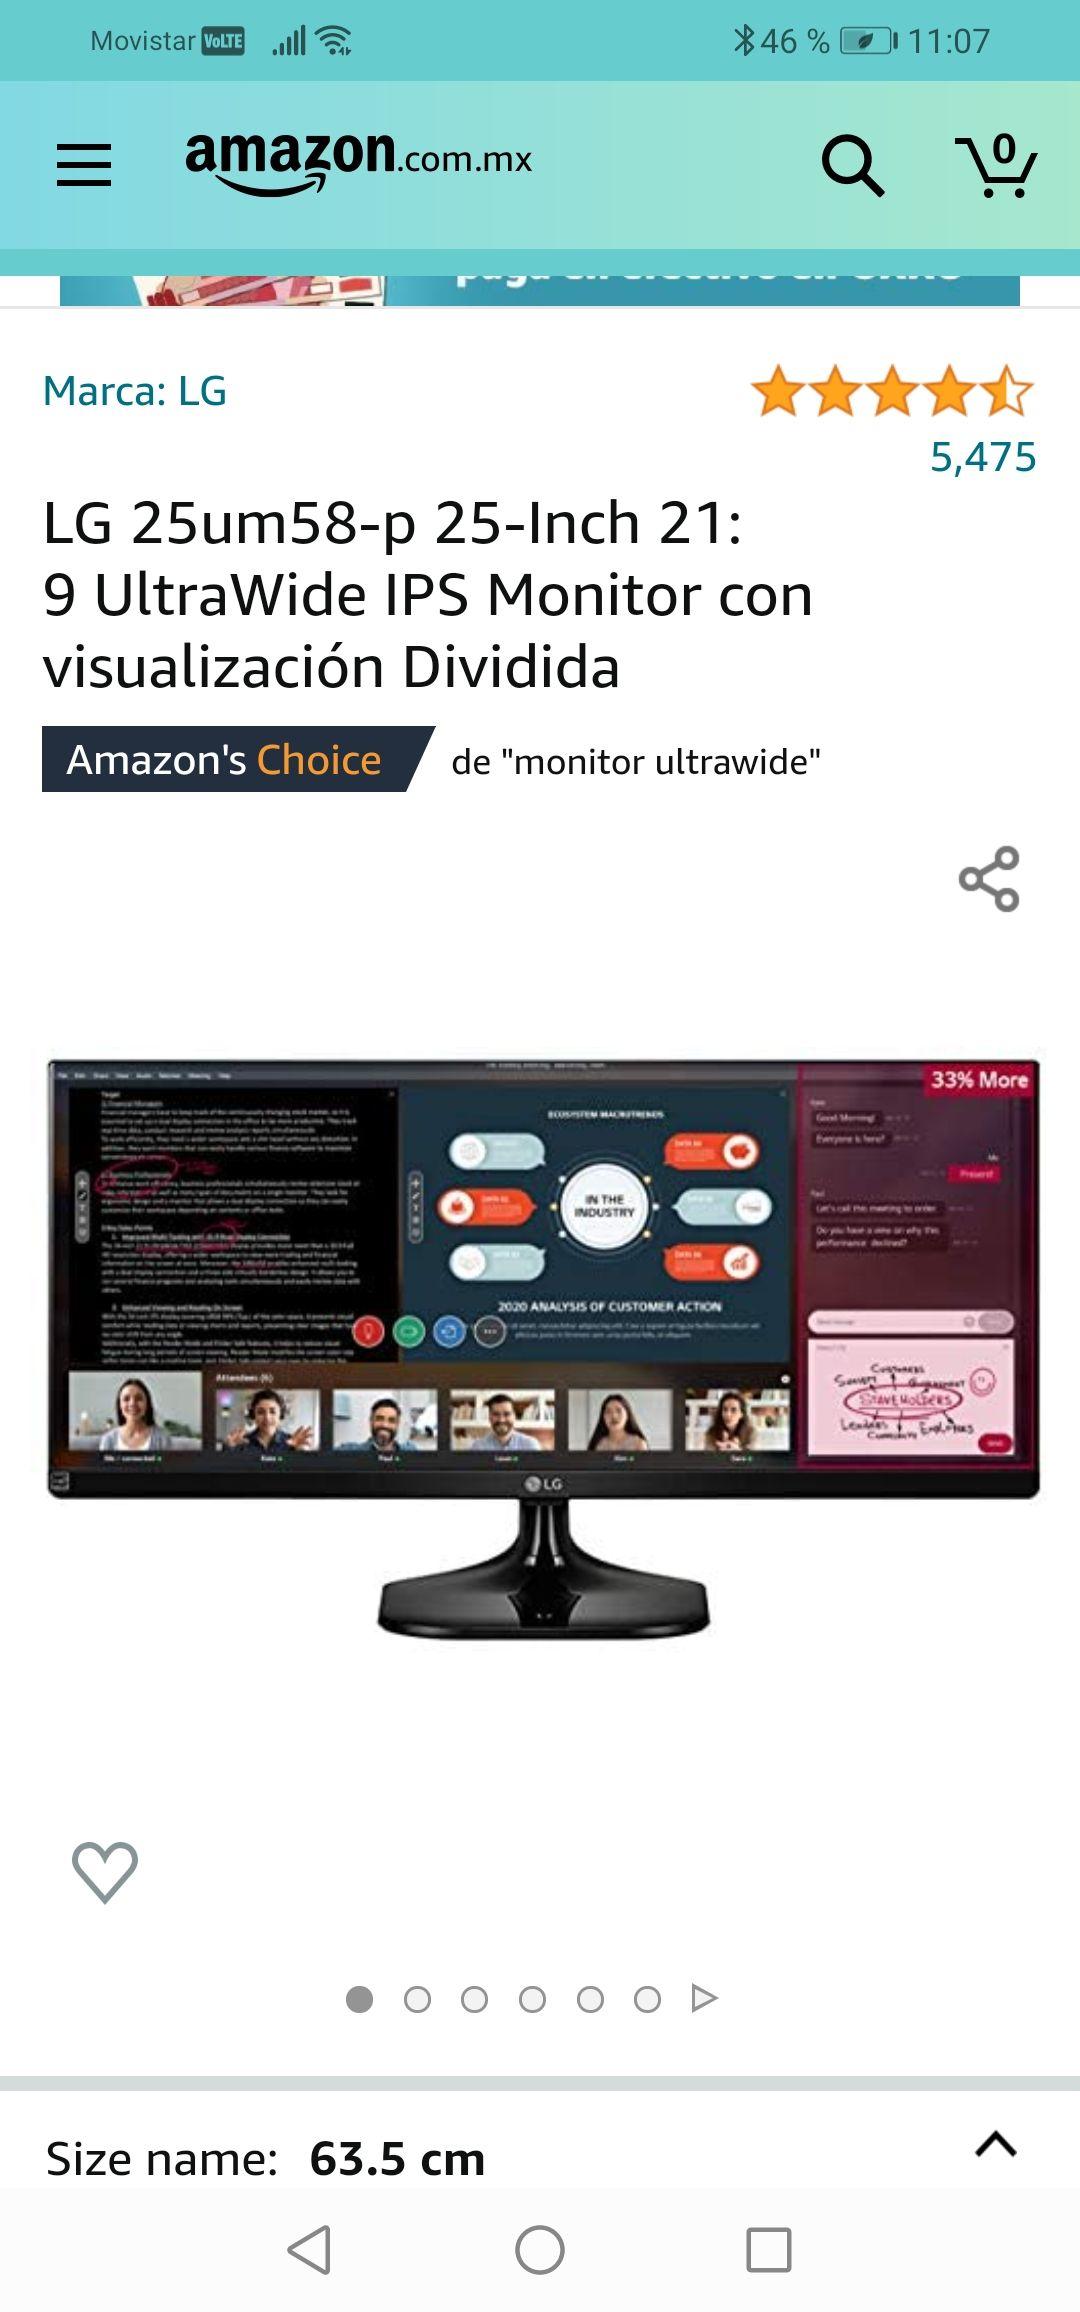 Amazon : LG 25um58-p 25-Inch 21: 9UltraWide IPS Monitor con visualización Dividida